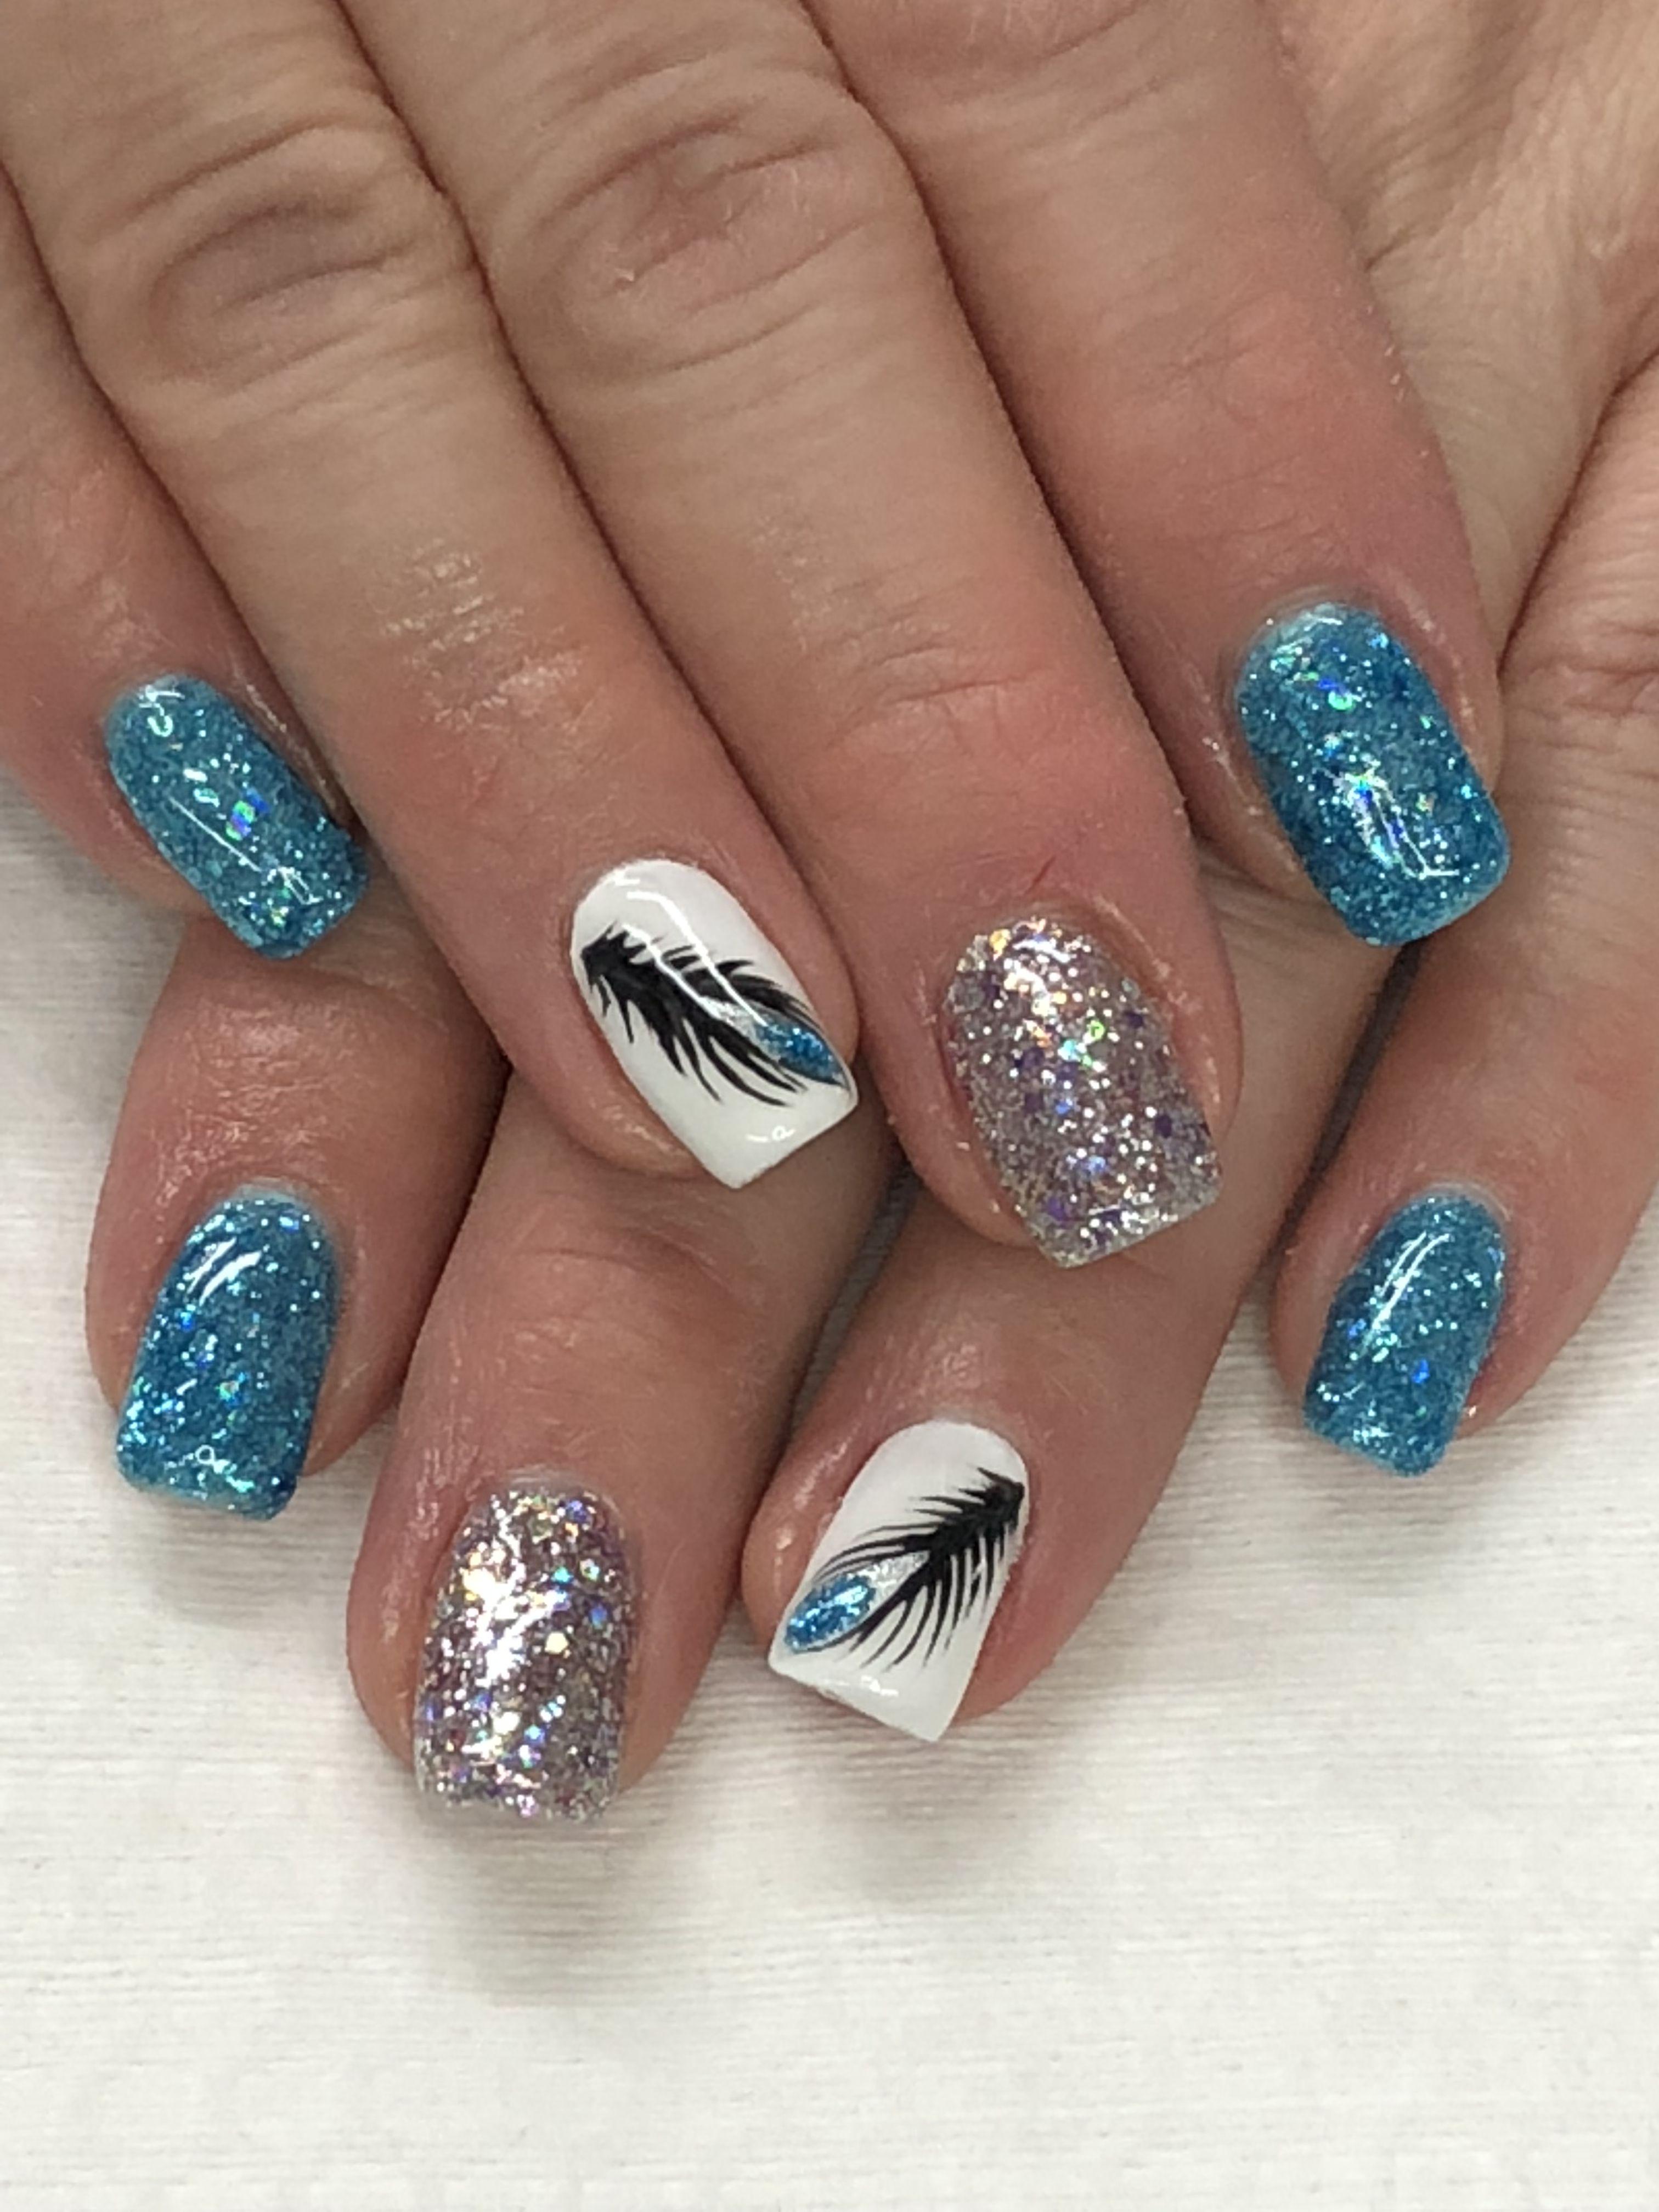 Peacock Feather Light Elegance Glacier Blue Elvis Pelvis Just White Buttercream Hand Painted Gel Nails Feather Nails Nails Gel Nail Designs